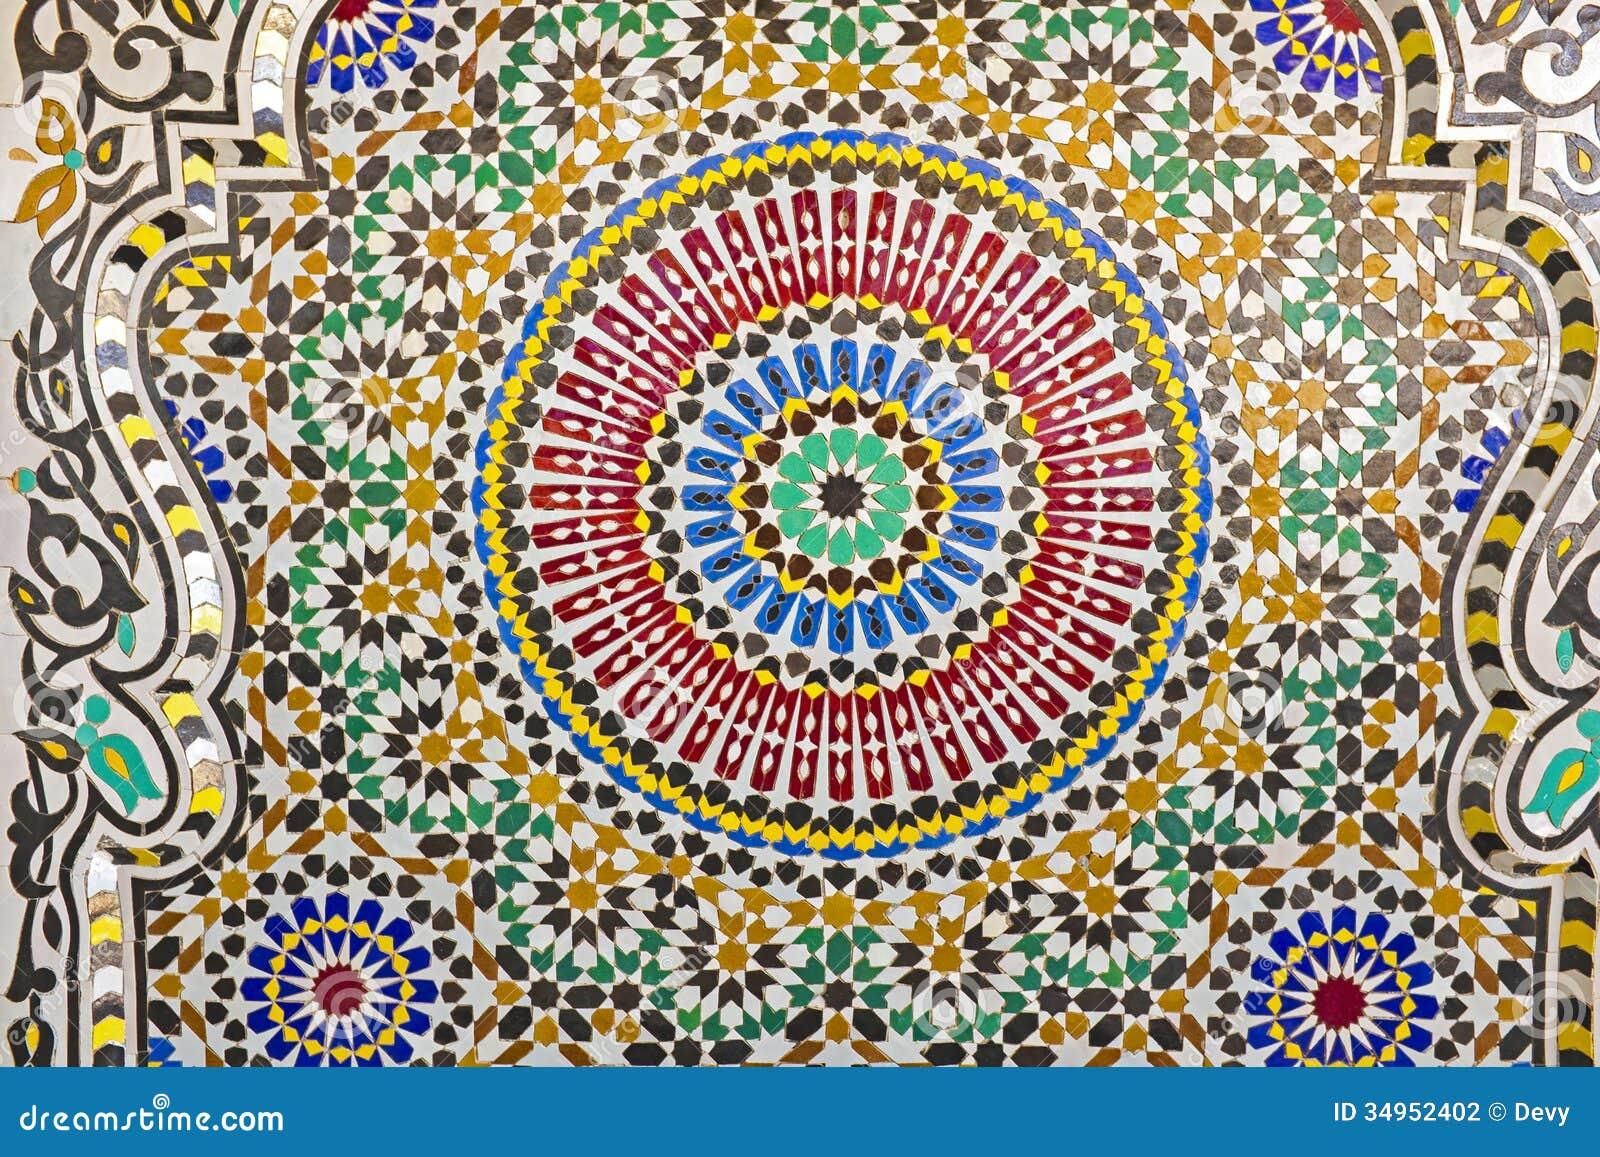 mosa que orientale au maroc photographie stock image. Black Bedroom Furniture Sets. Home Design Ideas